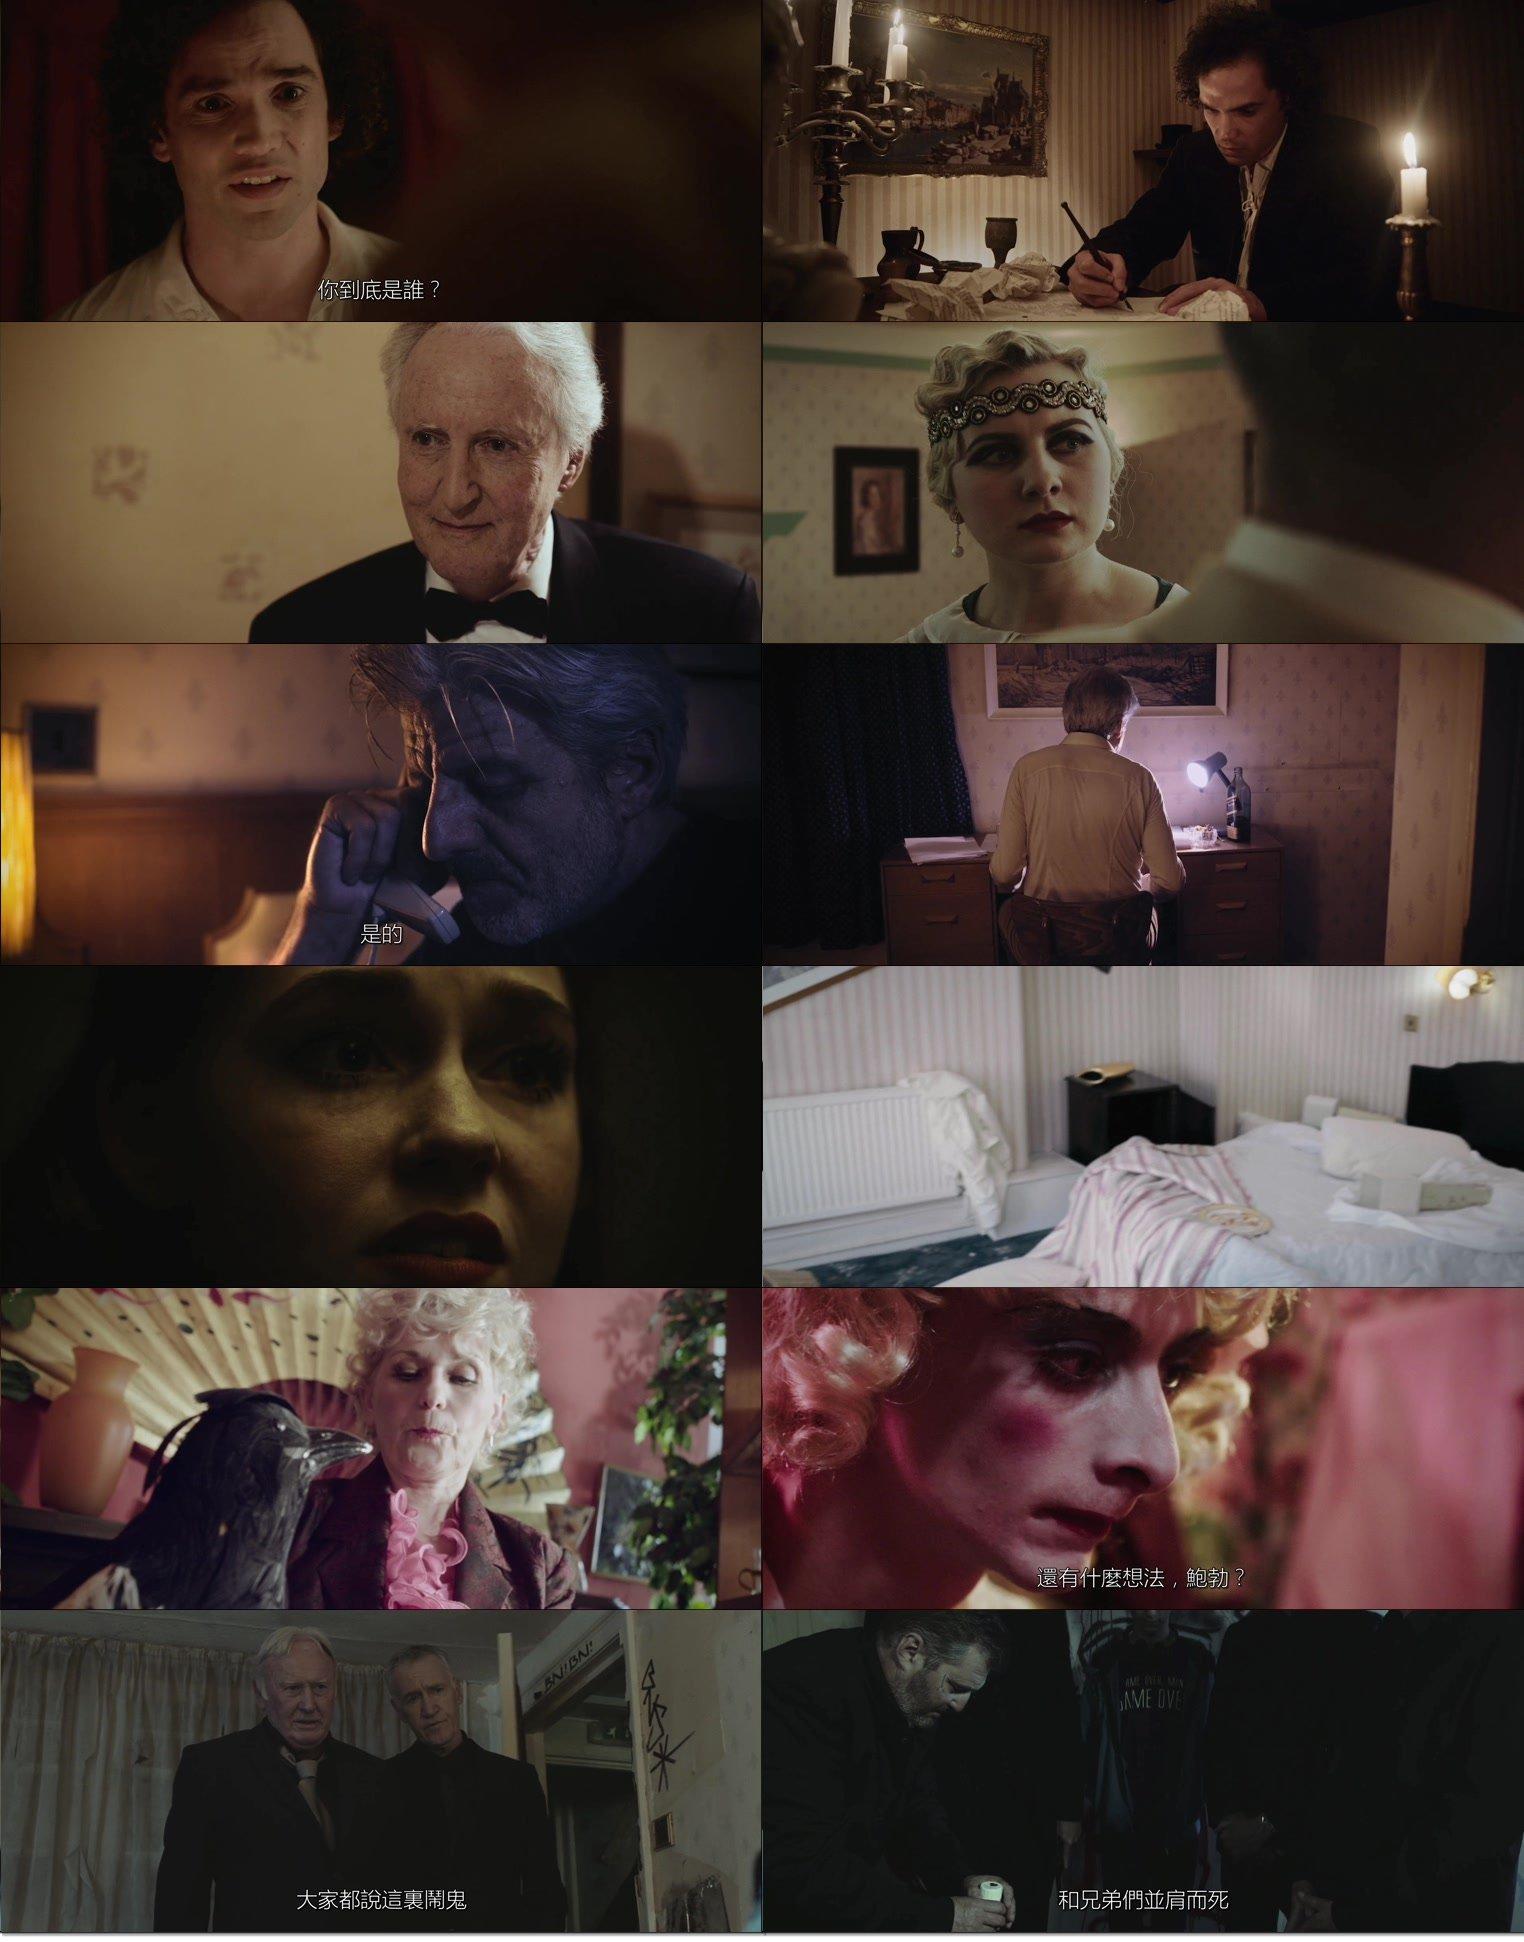 The.Haunted.Hotel.2021.1080p.WEBRip.x264.mkv